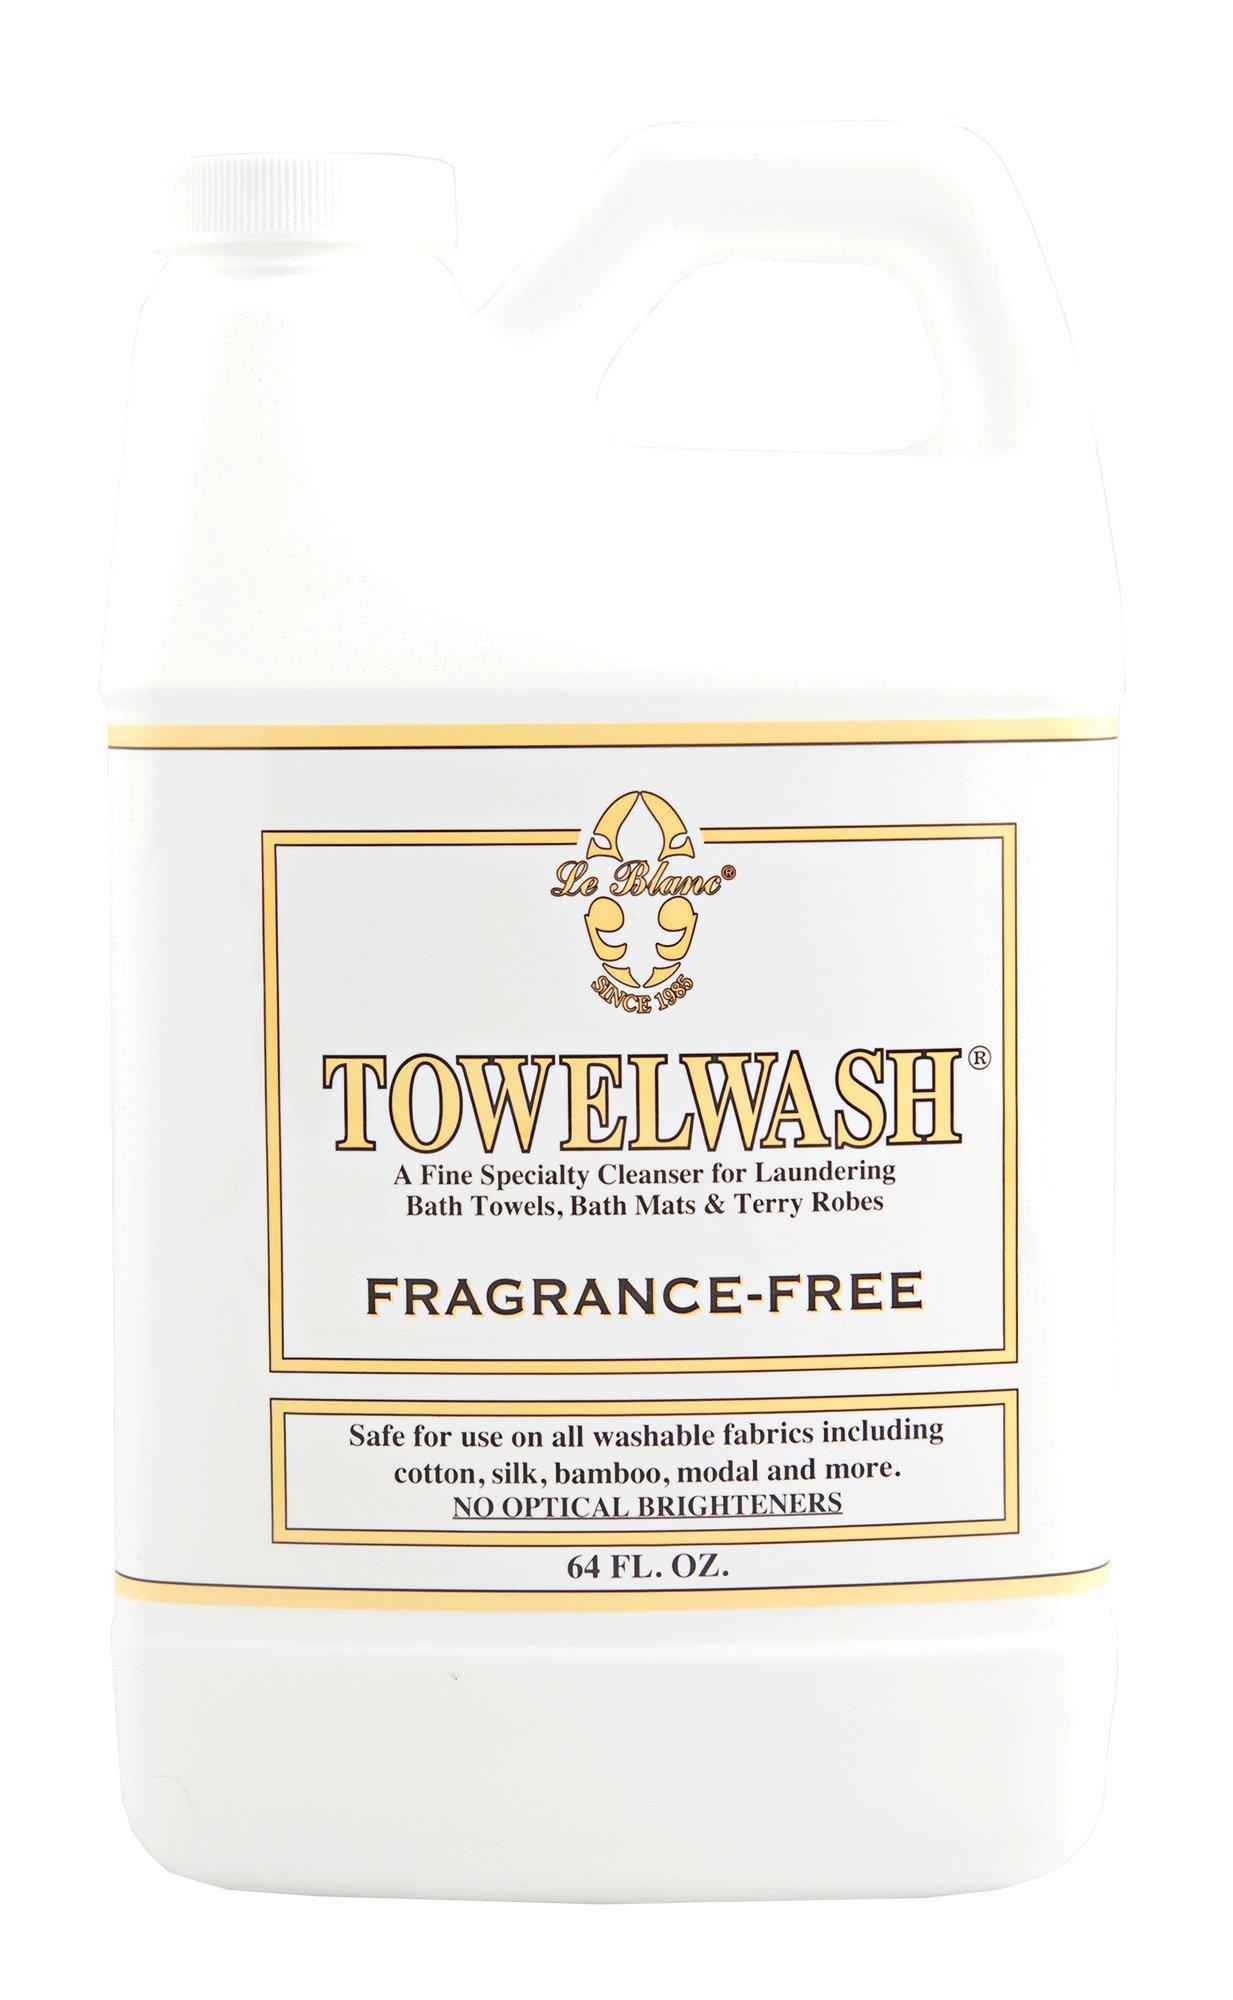 Le Blanc® Fragrance-Free Towelwash® - 64 FL. OZ., 6 pack